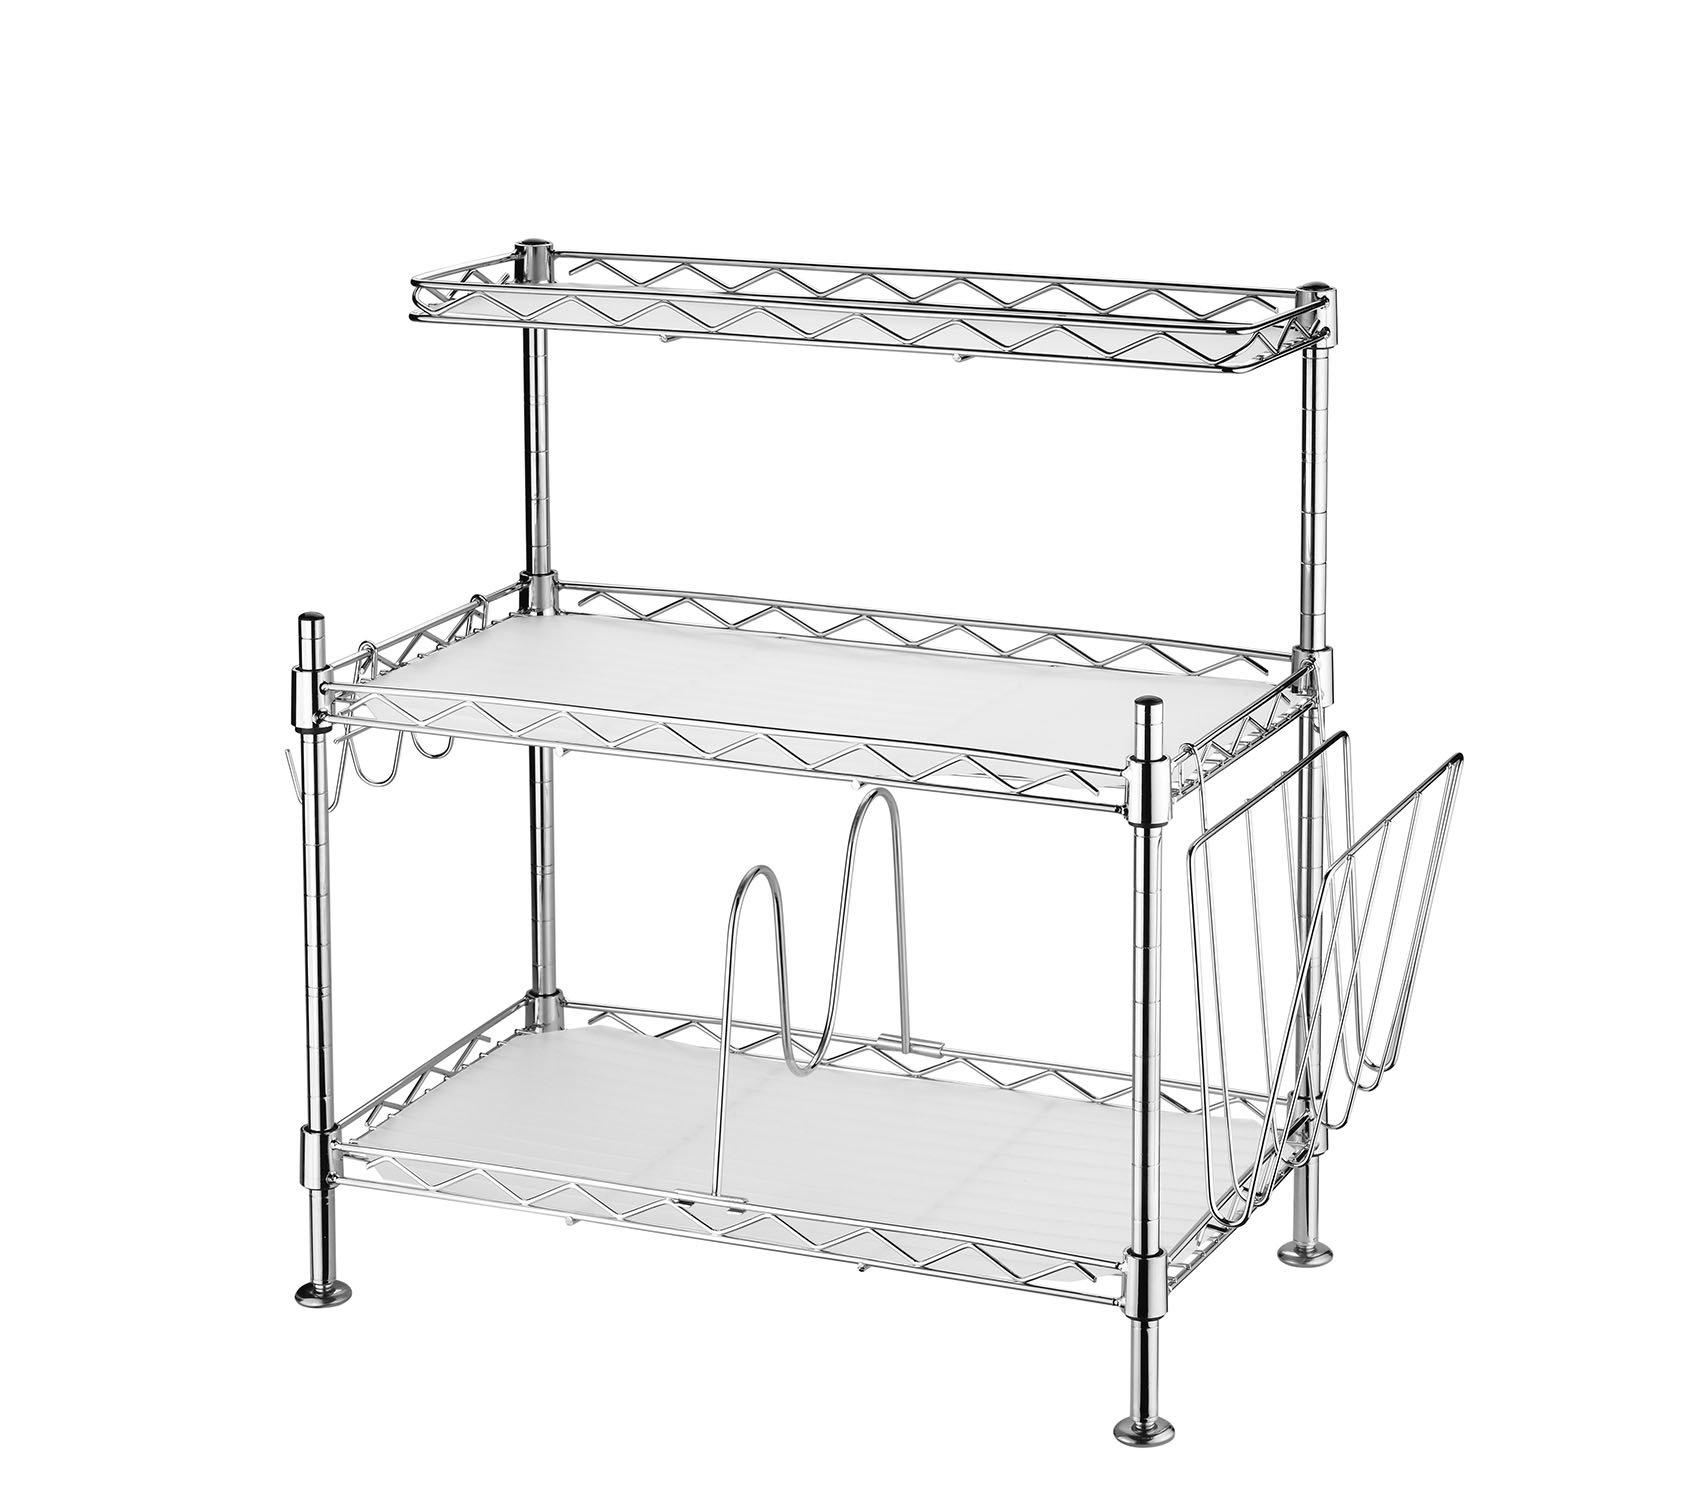 Adjustable Steel 3 Shelf Kitchen Cabinet and Counter Rack Storage ...